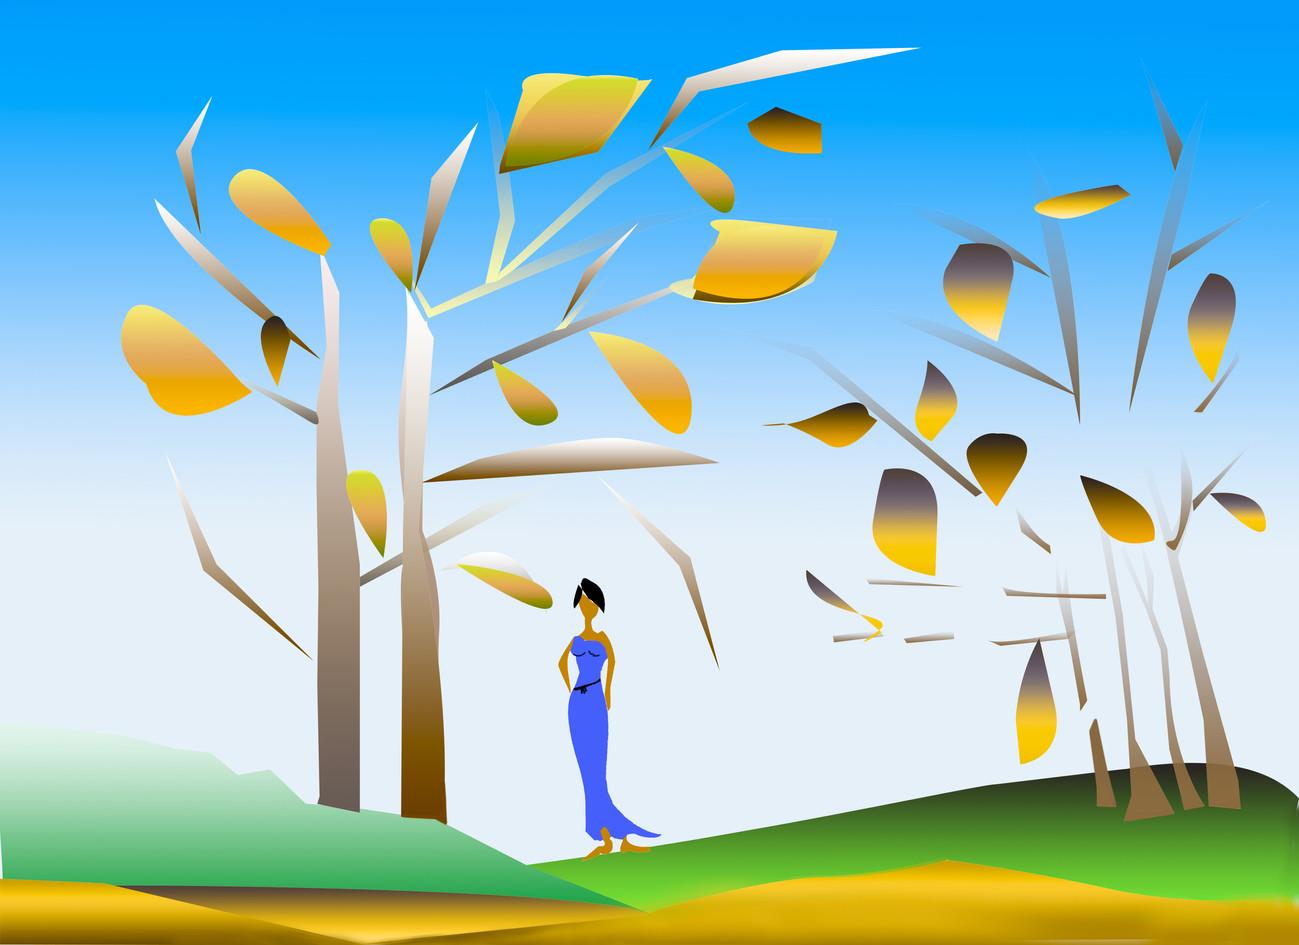 woman under tree illustration.jpg